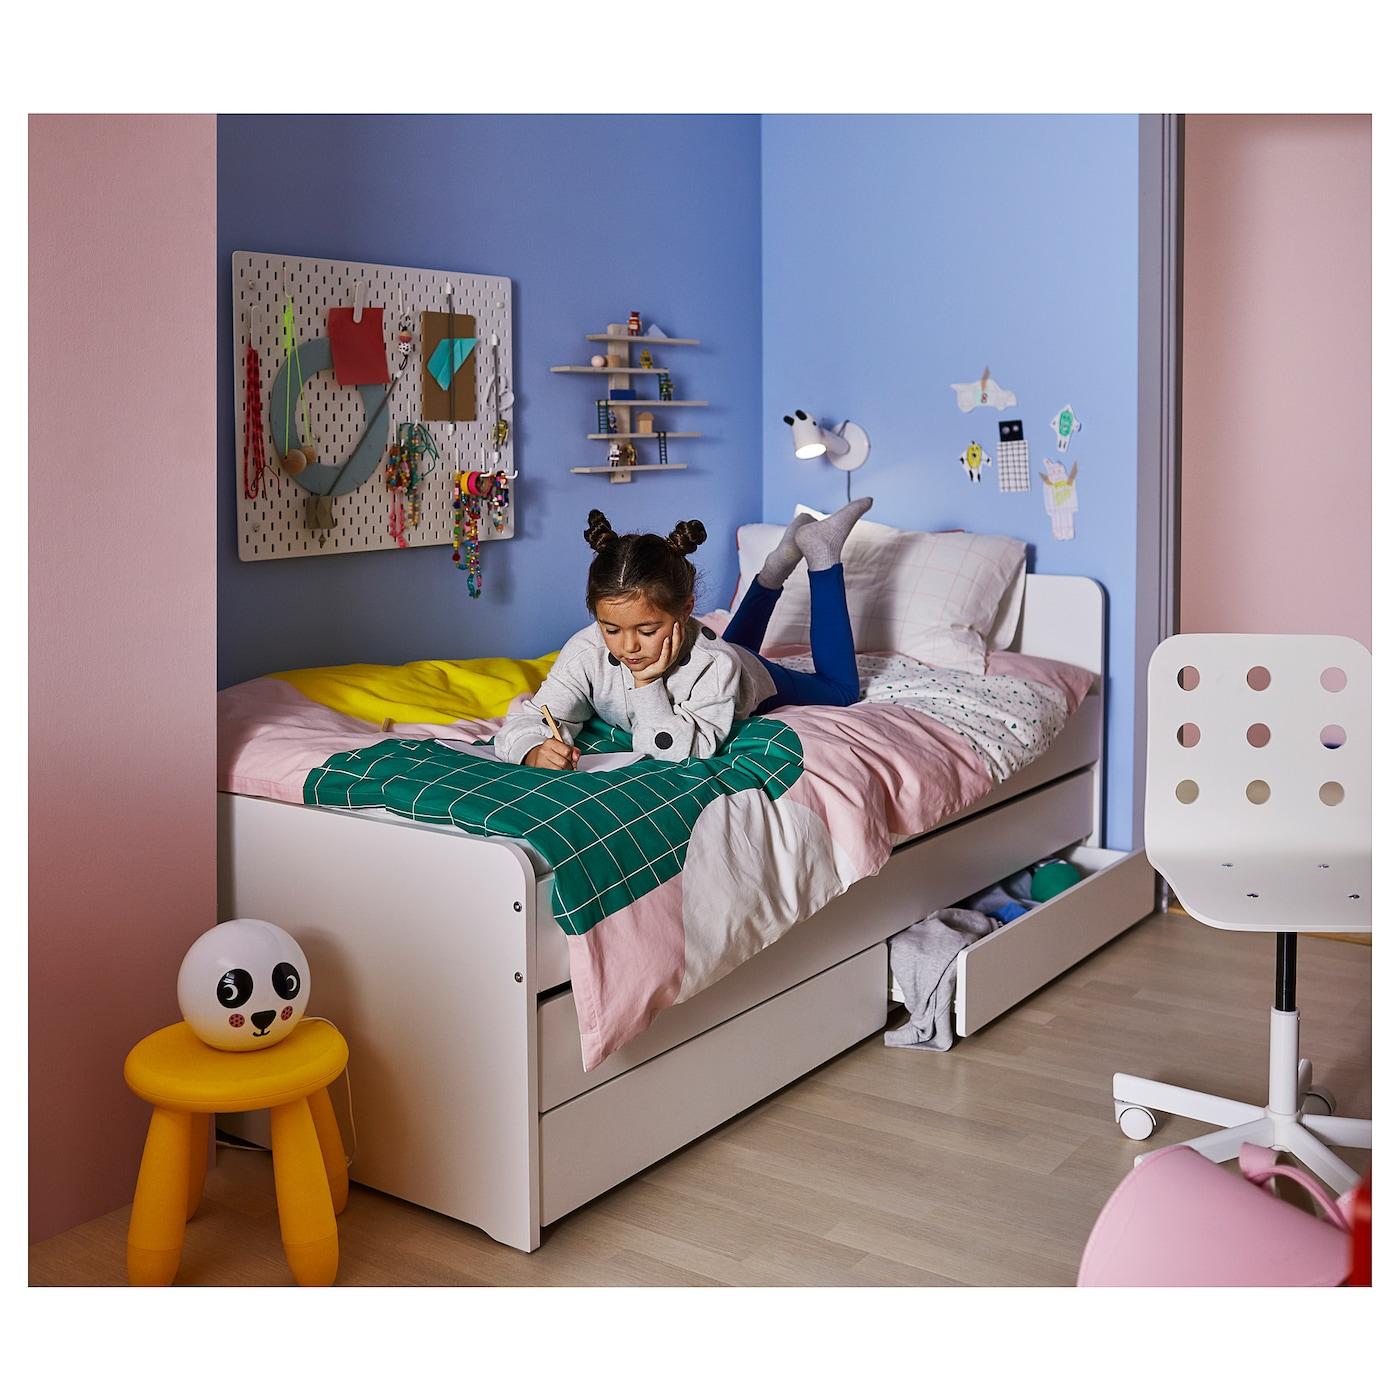 SLÄKT Bed frame with underbed and storage - white 4x4 cm